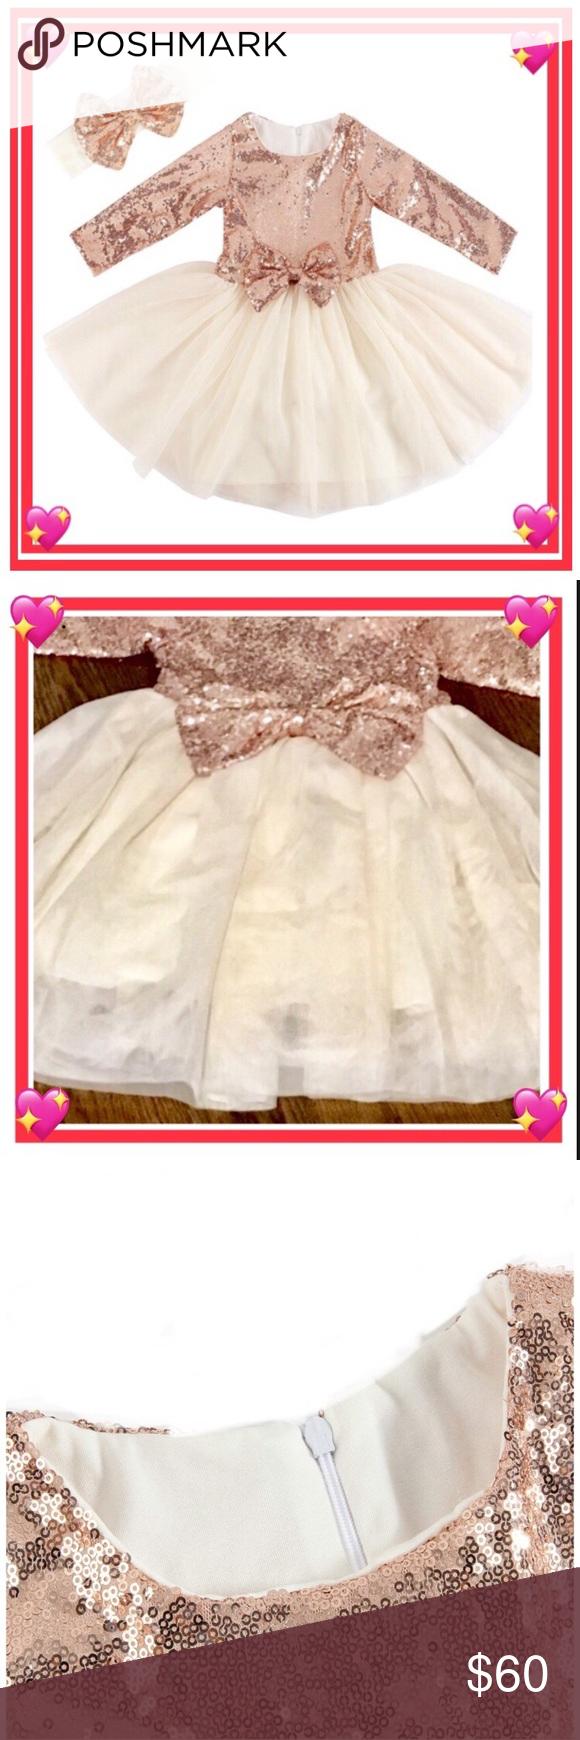 Sequin Tulle Flower Girl Birthday Party Dress Party Dresses With Sleeves Trendy Party Dresses Long Sleeve Sequin Dress [ 1740 x 580 Pixel ]